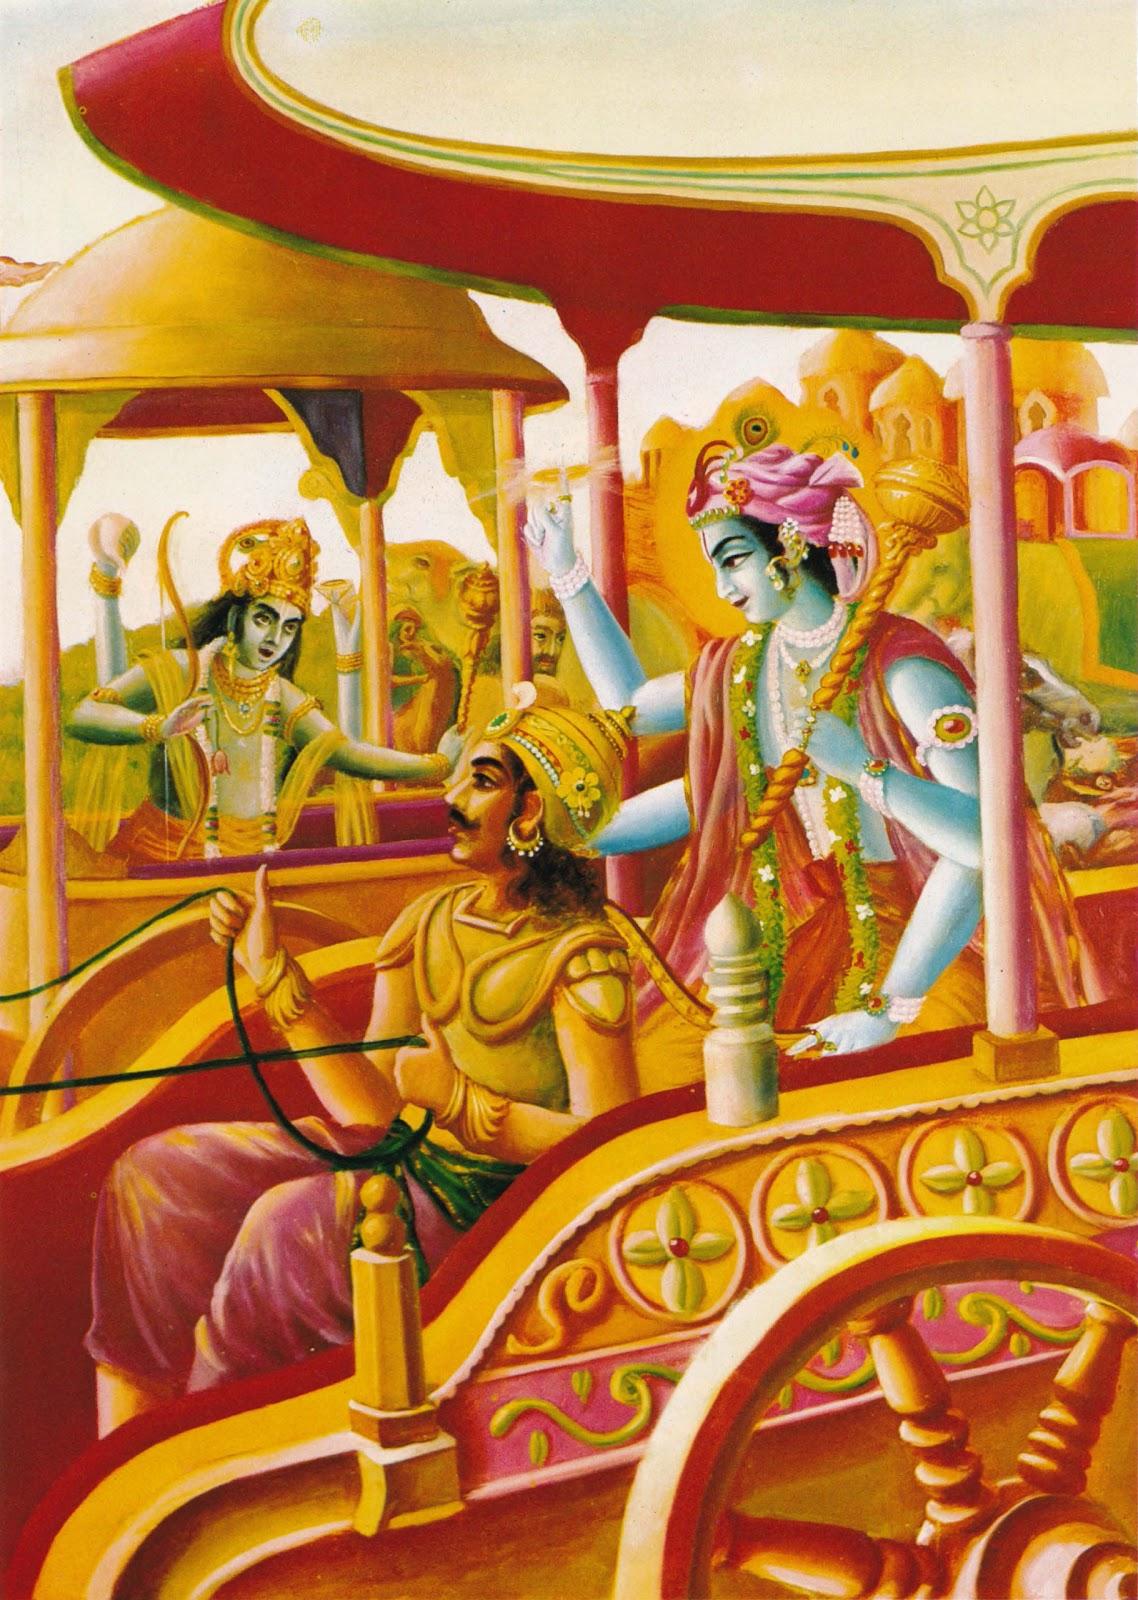 PunjabKesari, Paundraka vasudeva, Paundraka, Vasudeva, Nakli Krishna, Lord Krishna, Sri Krishna, Dharmik Katha in Hindi, Religious Story In hindi, Dant Katha in hindi